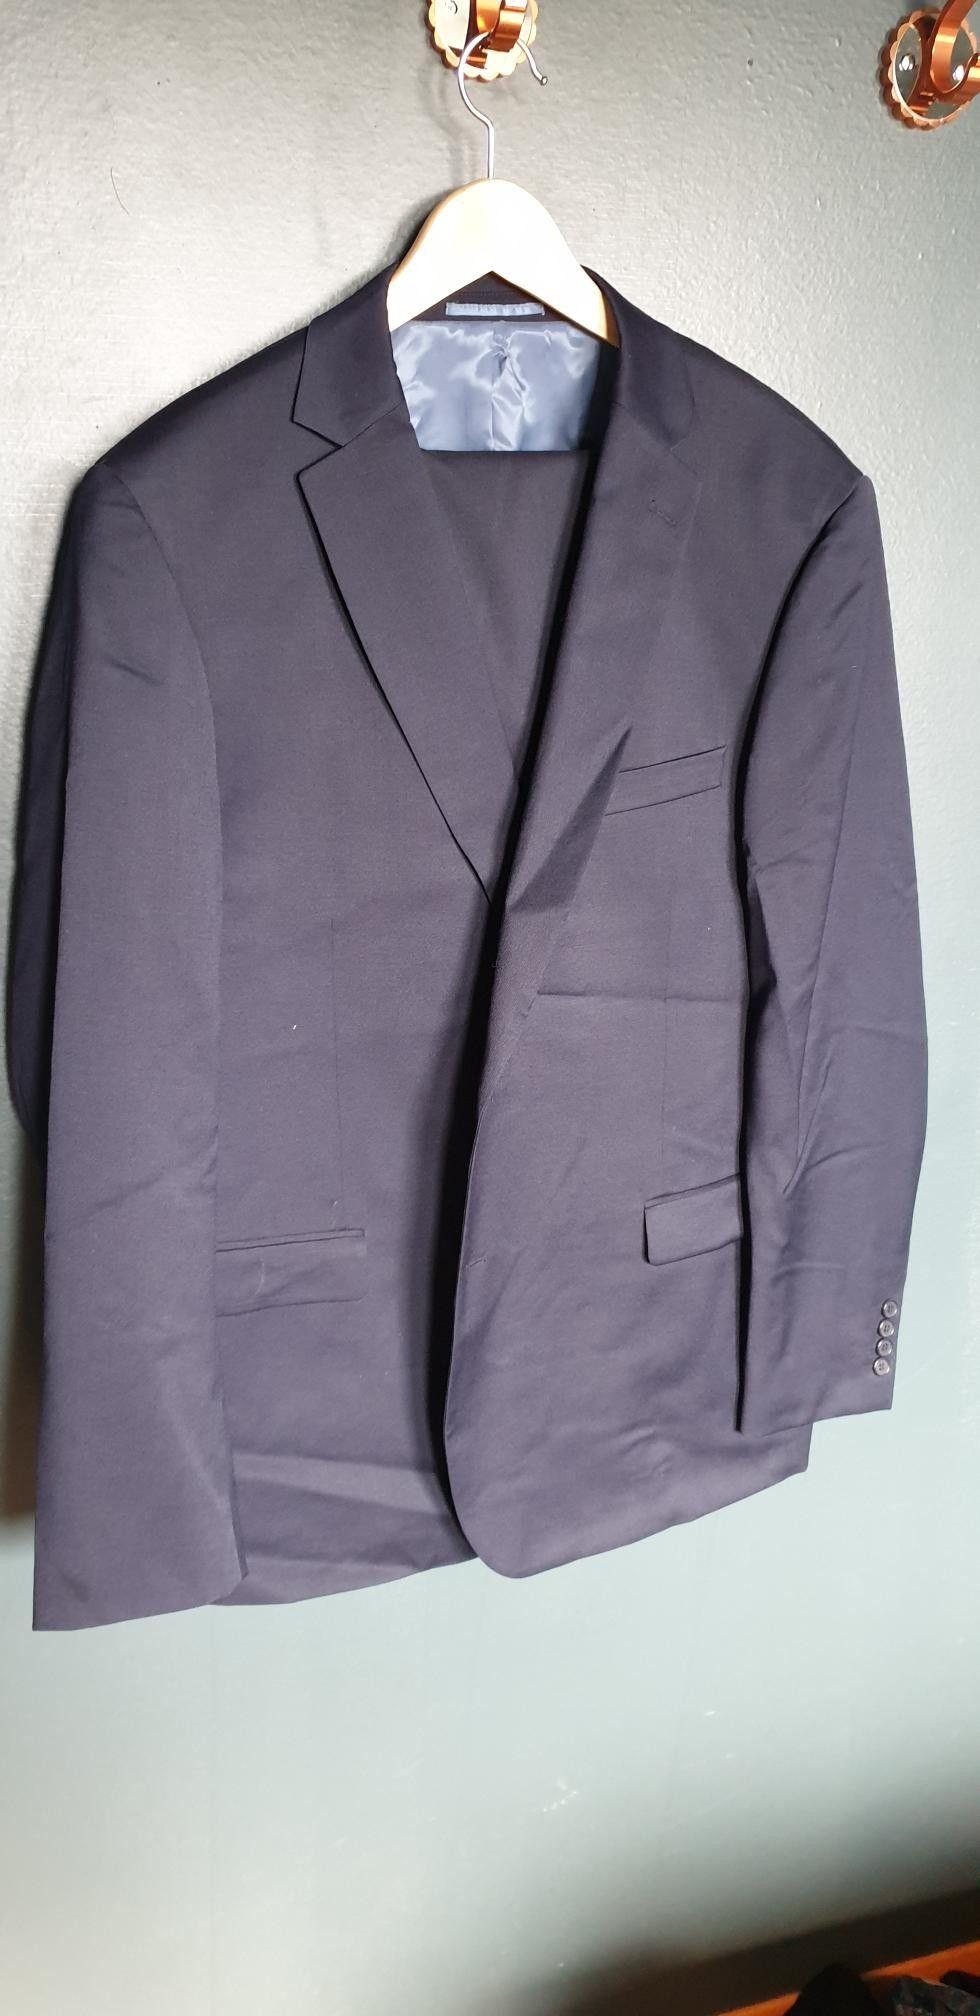 dressmann jakke blazer   FINN.no